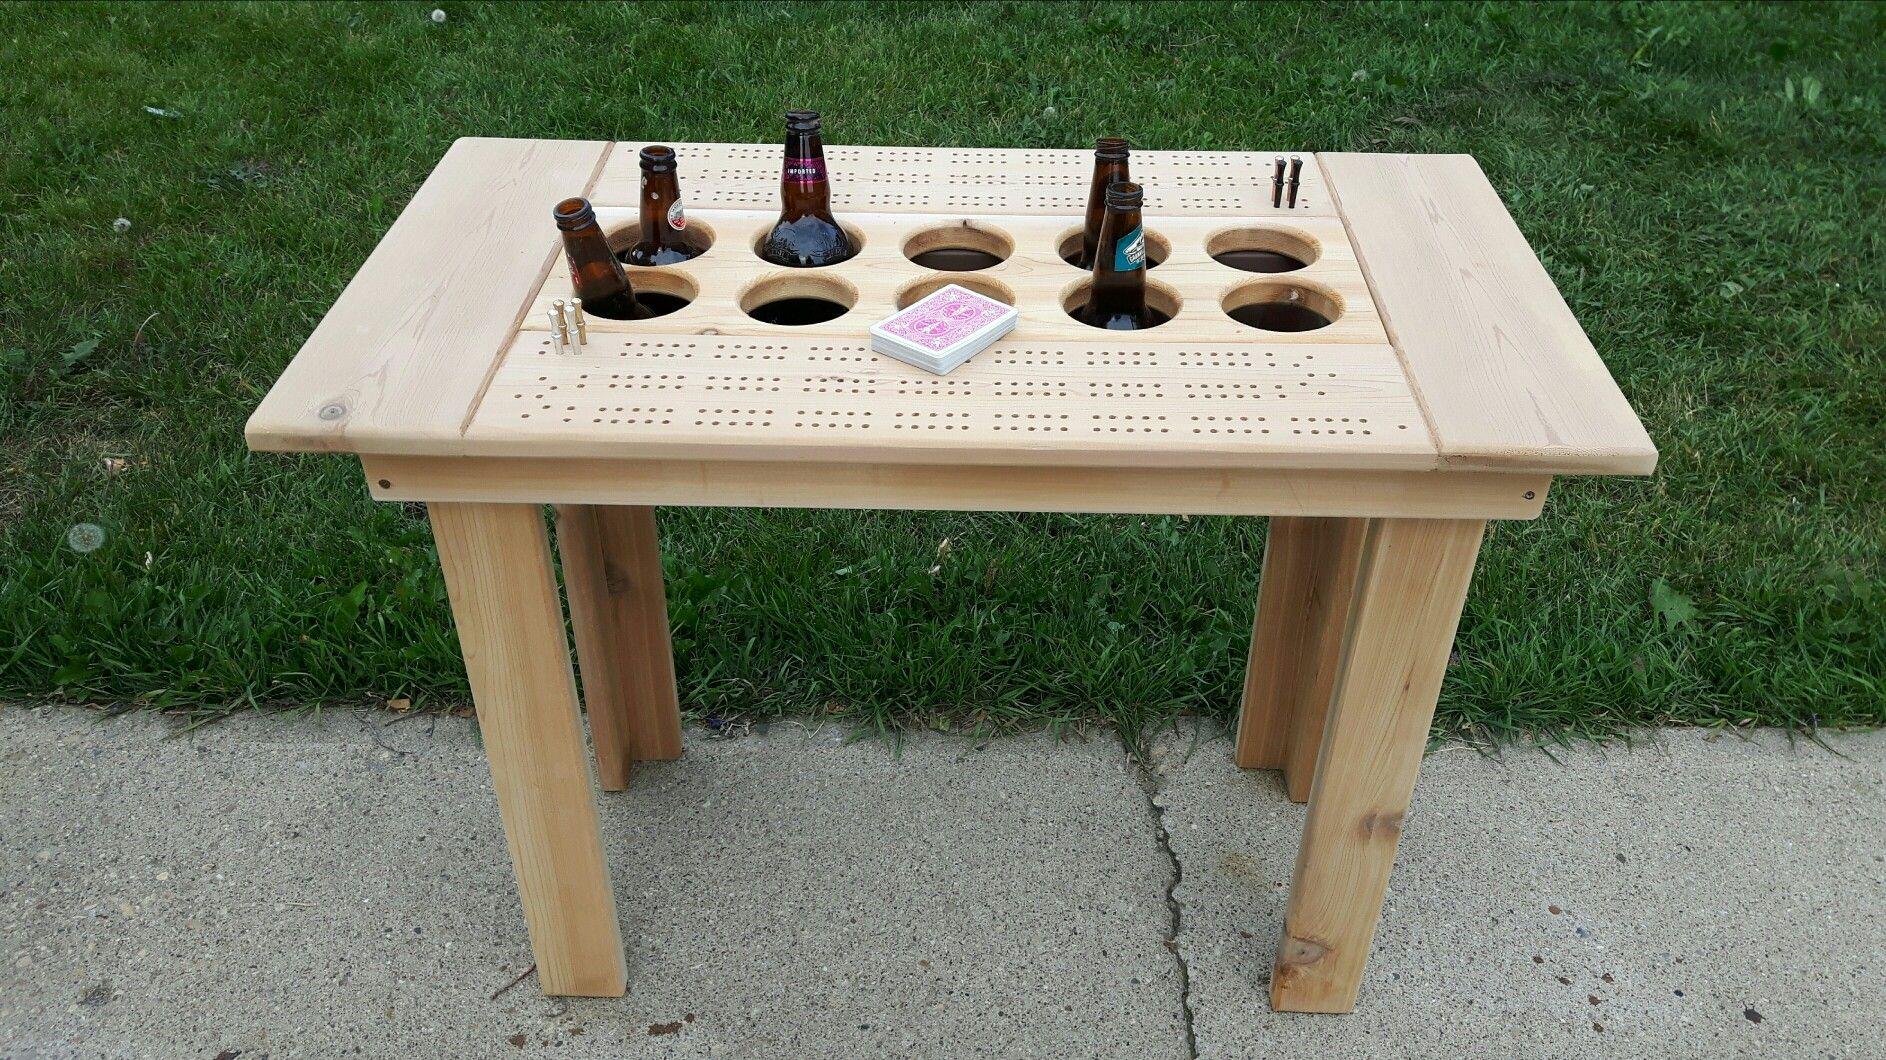 Cribbage Cooler Table Cribbage Cribbage Table Large Cribbage Board